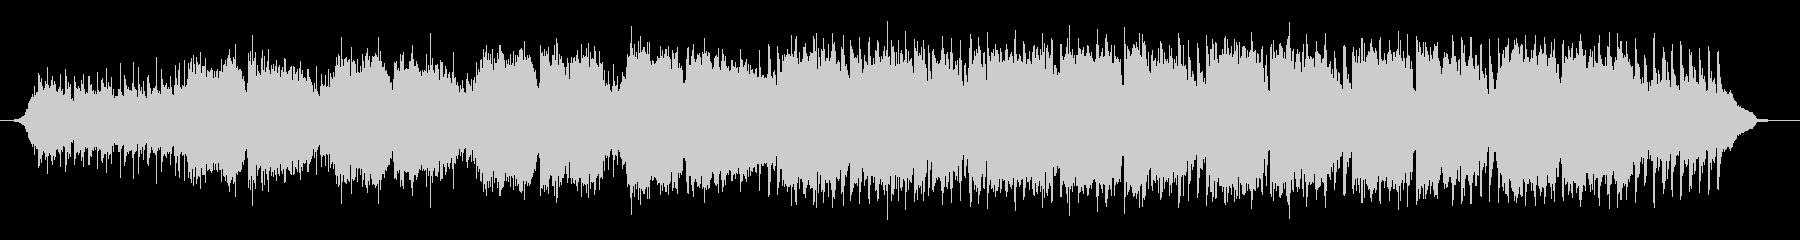 Prologueの未再生の波形